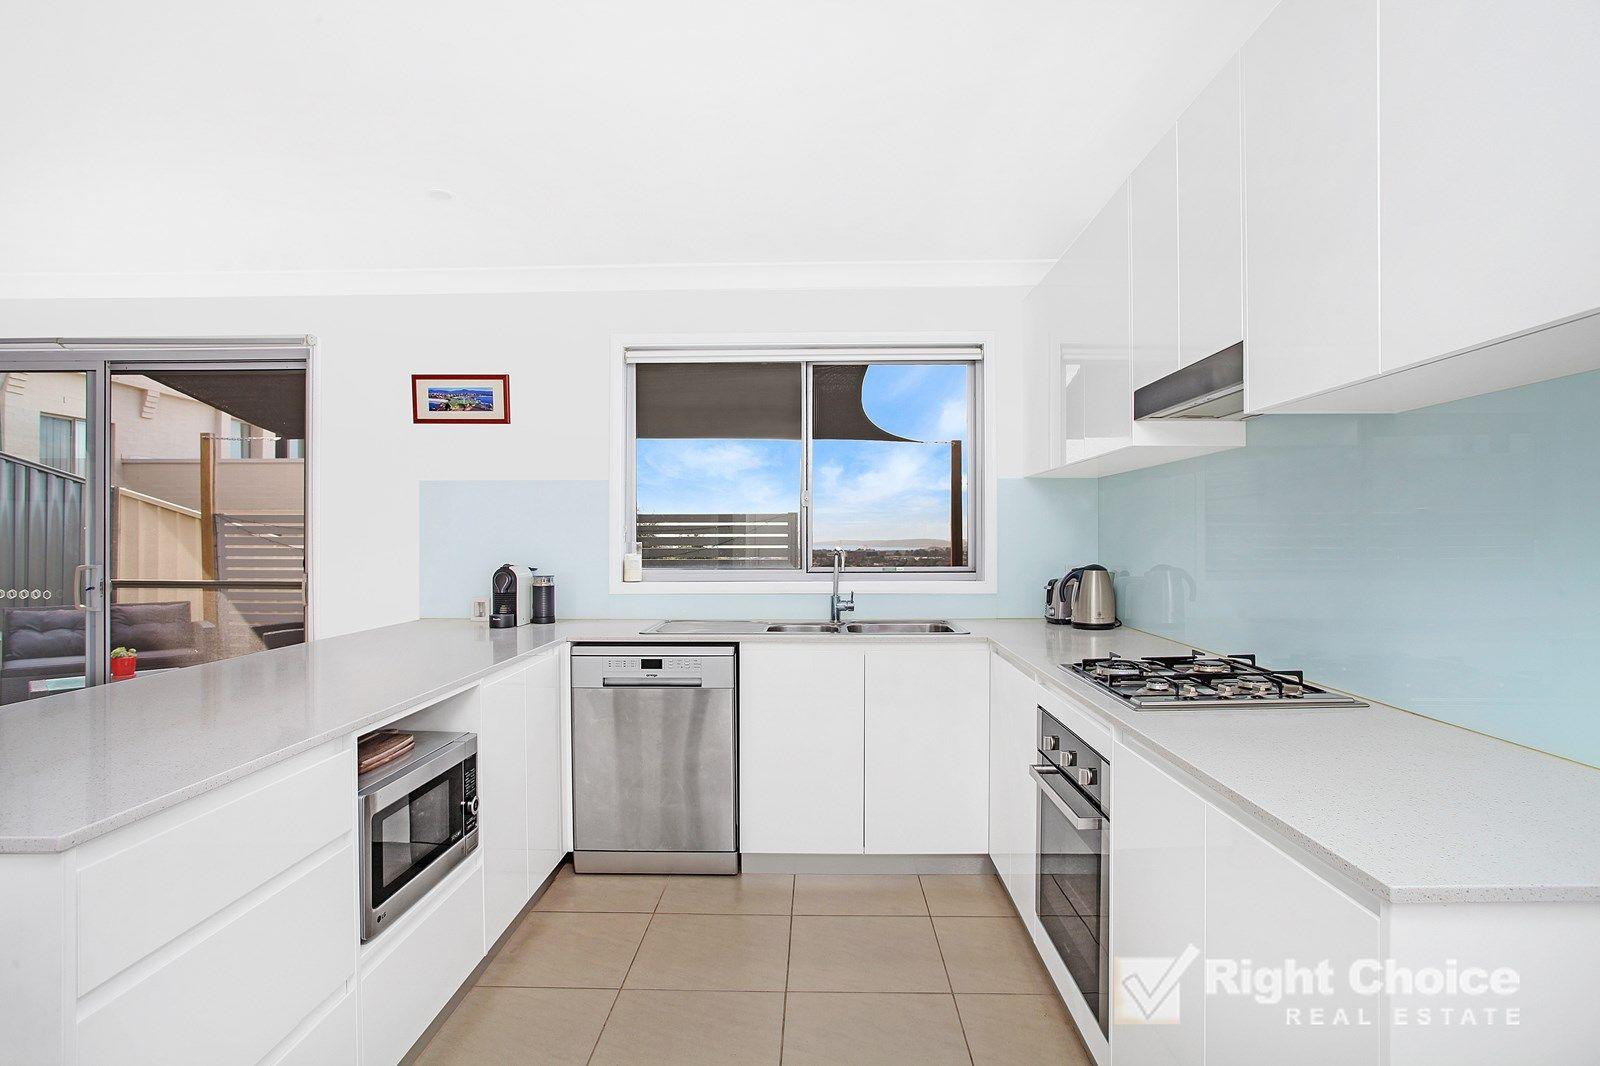 3/25 Yarle Crescent, Flinders NSW 2529, Image 1